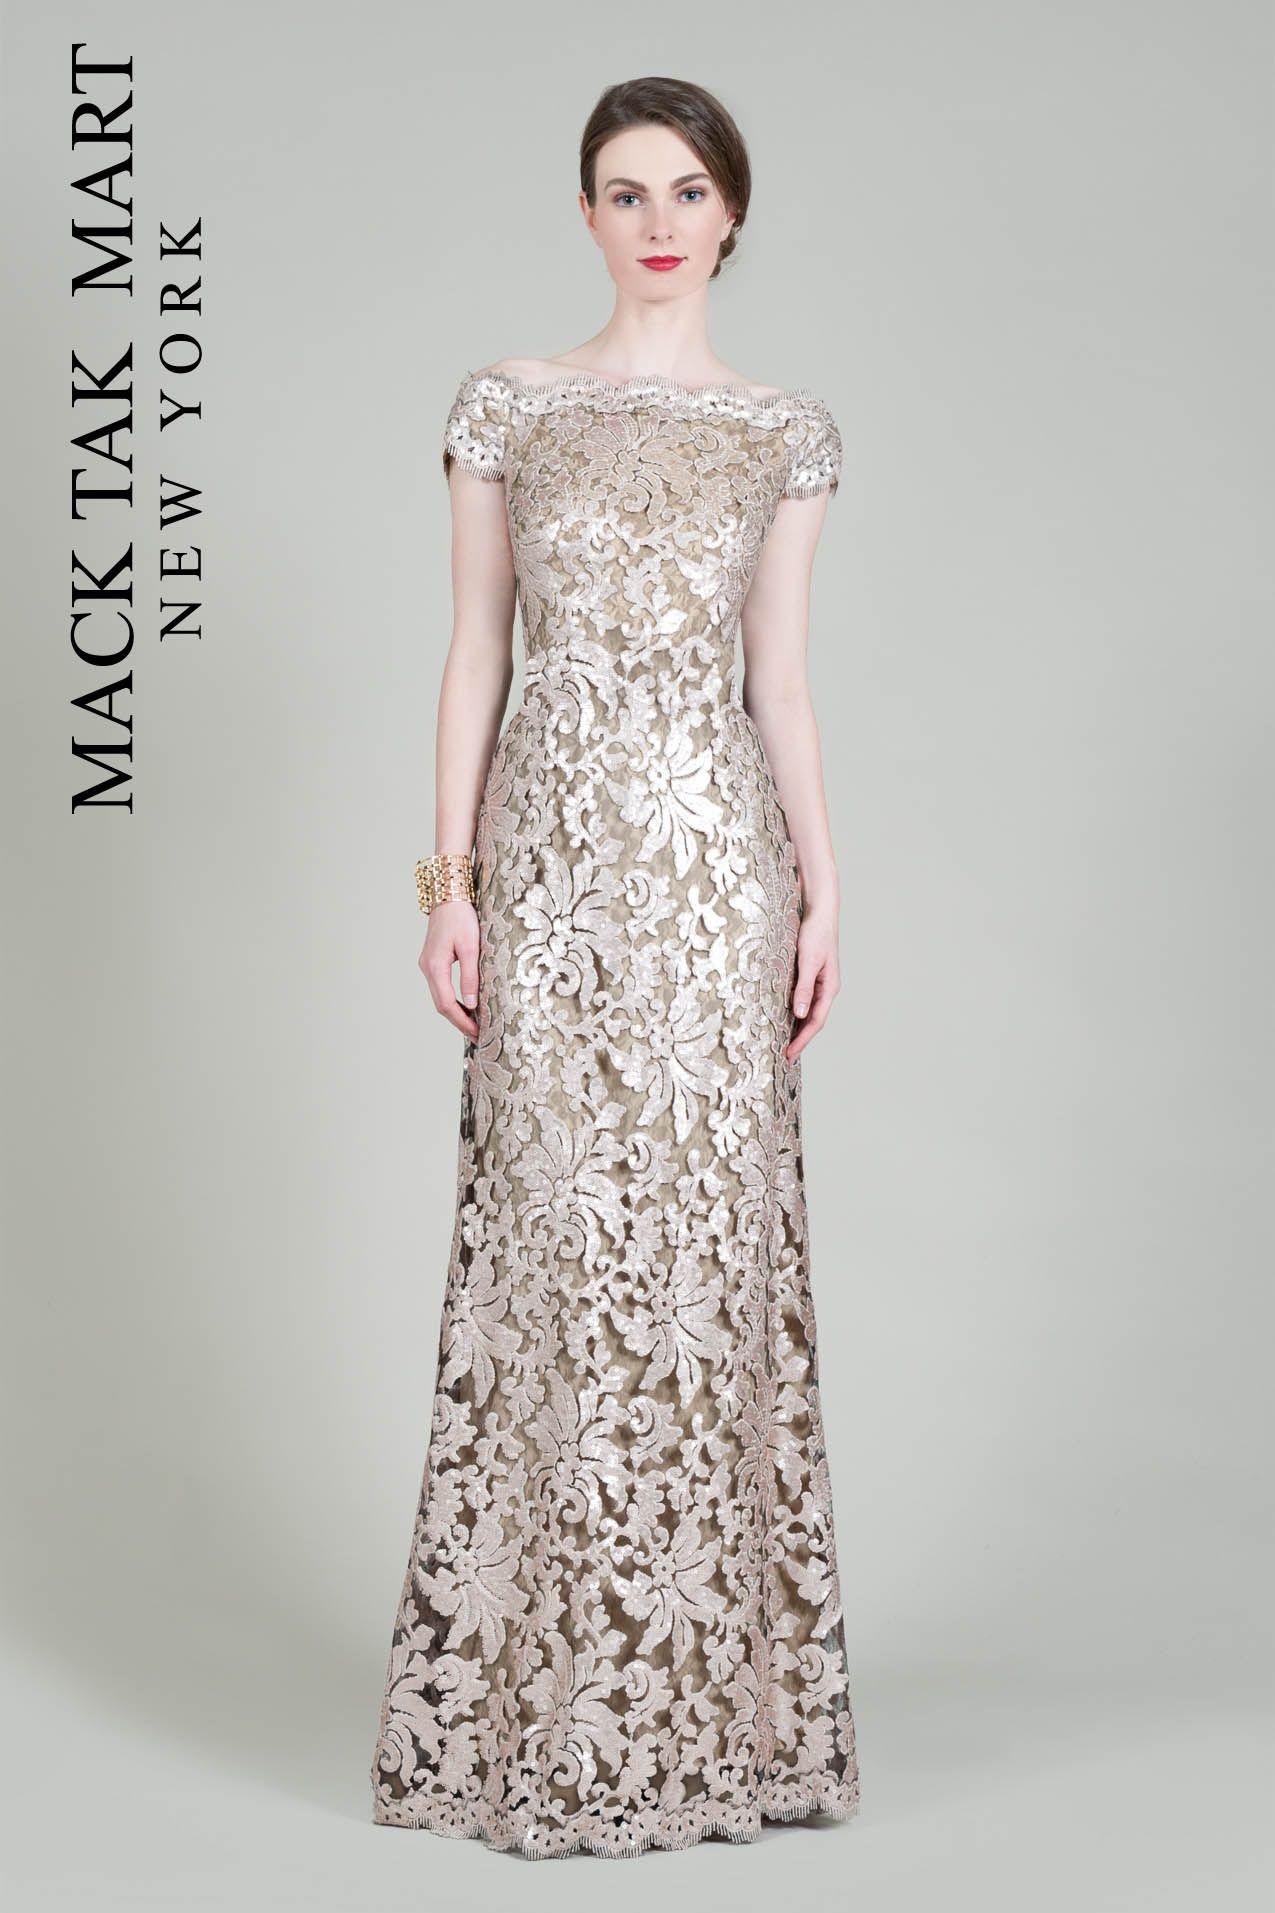 Pin by MackTak Rep on Tadashi Dresses | Pinterest | Tadashi and ...